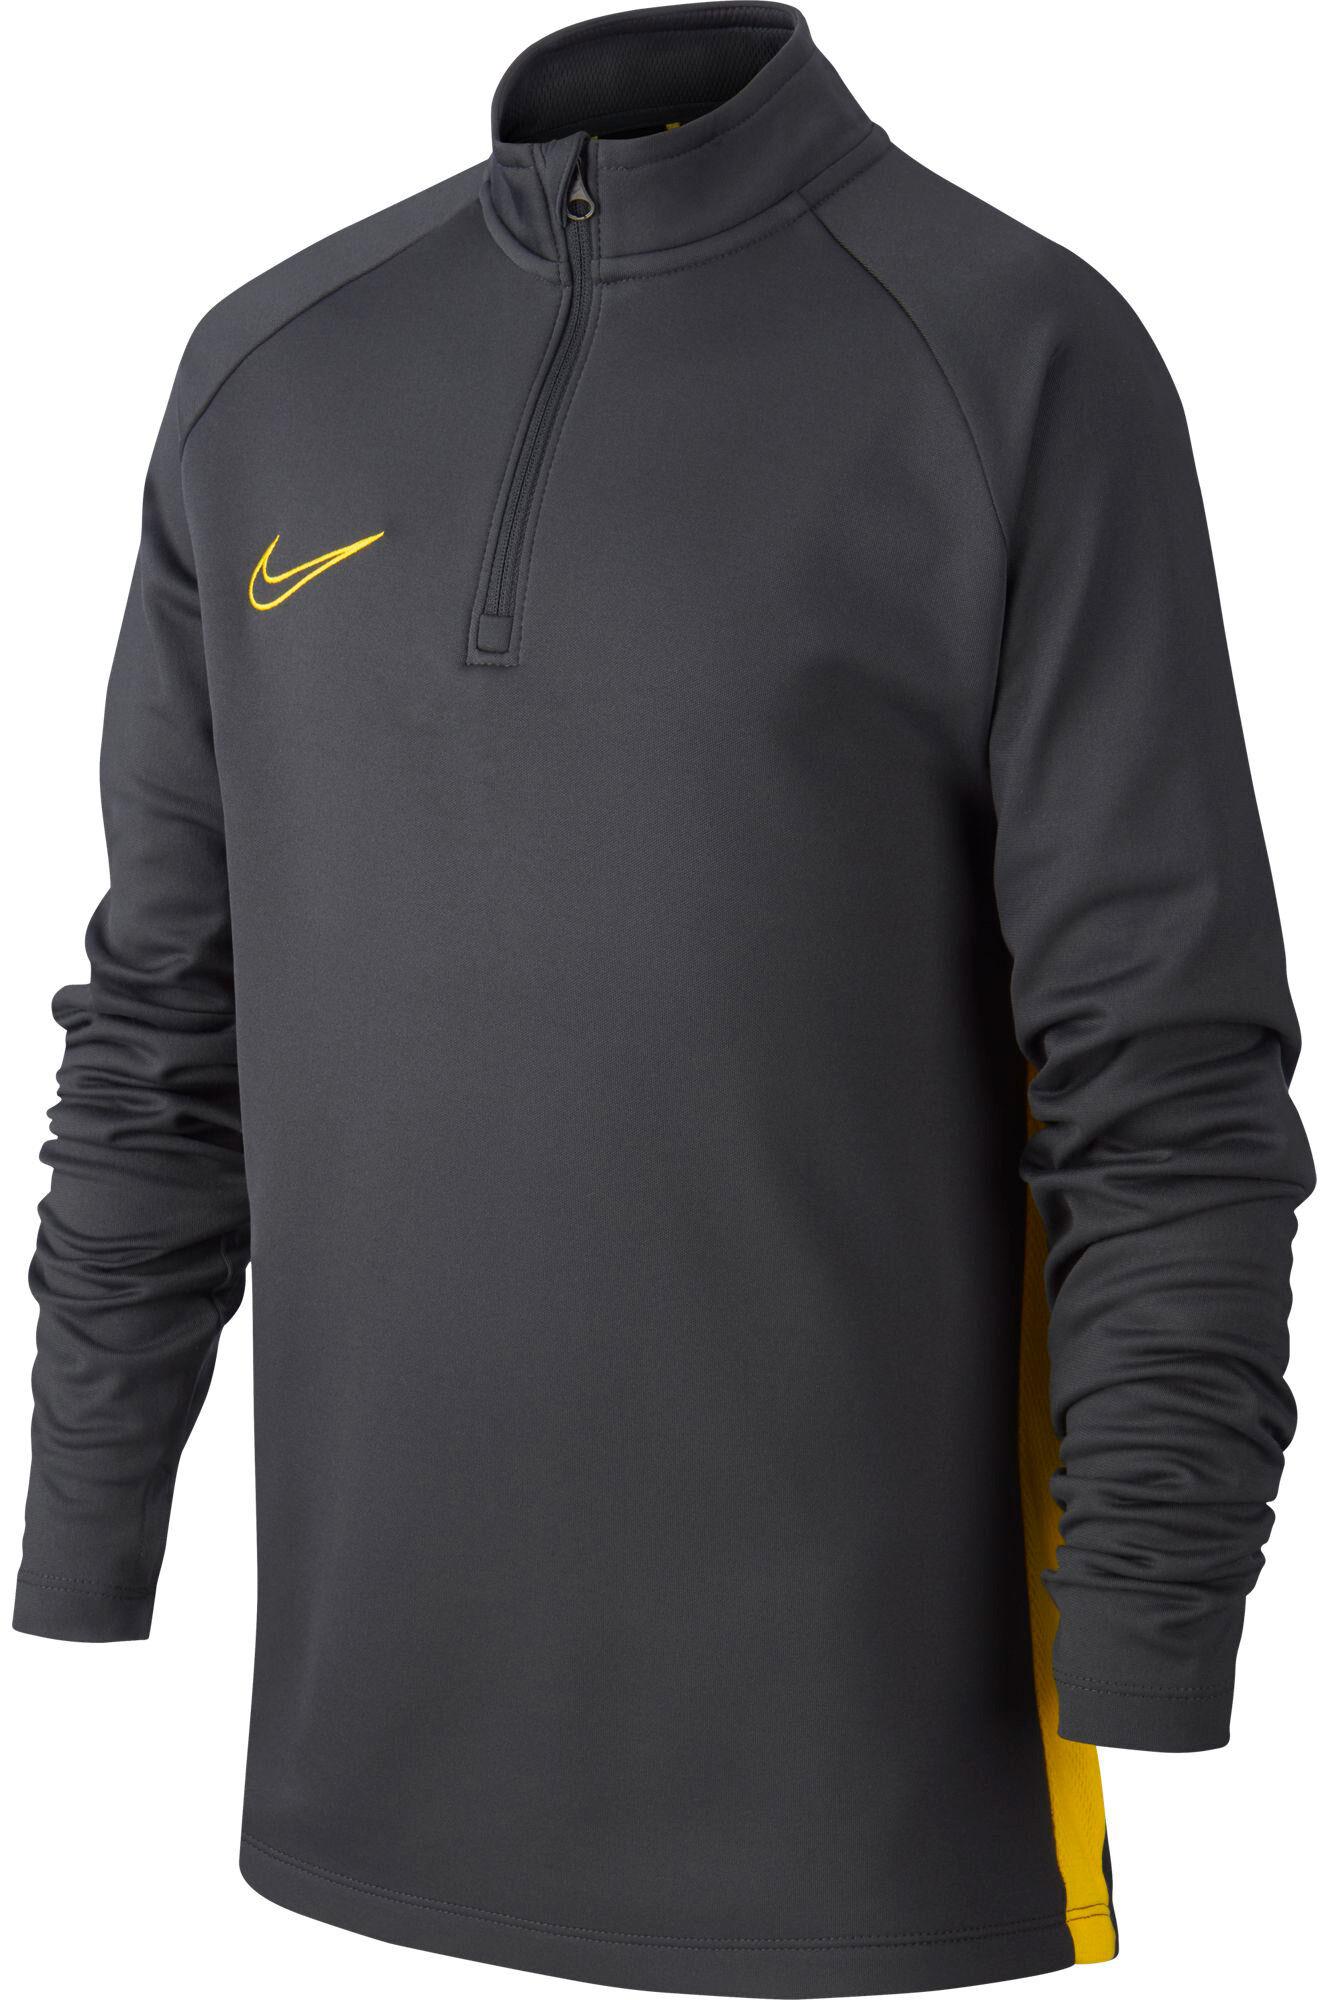 Intersport Intersport Intersport Hombre Hombre Camisetas Camisetas Nike Nike Hombre Nike Camisetas Hombre Nike Intersport Camisetas XwnS5qUx66